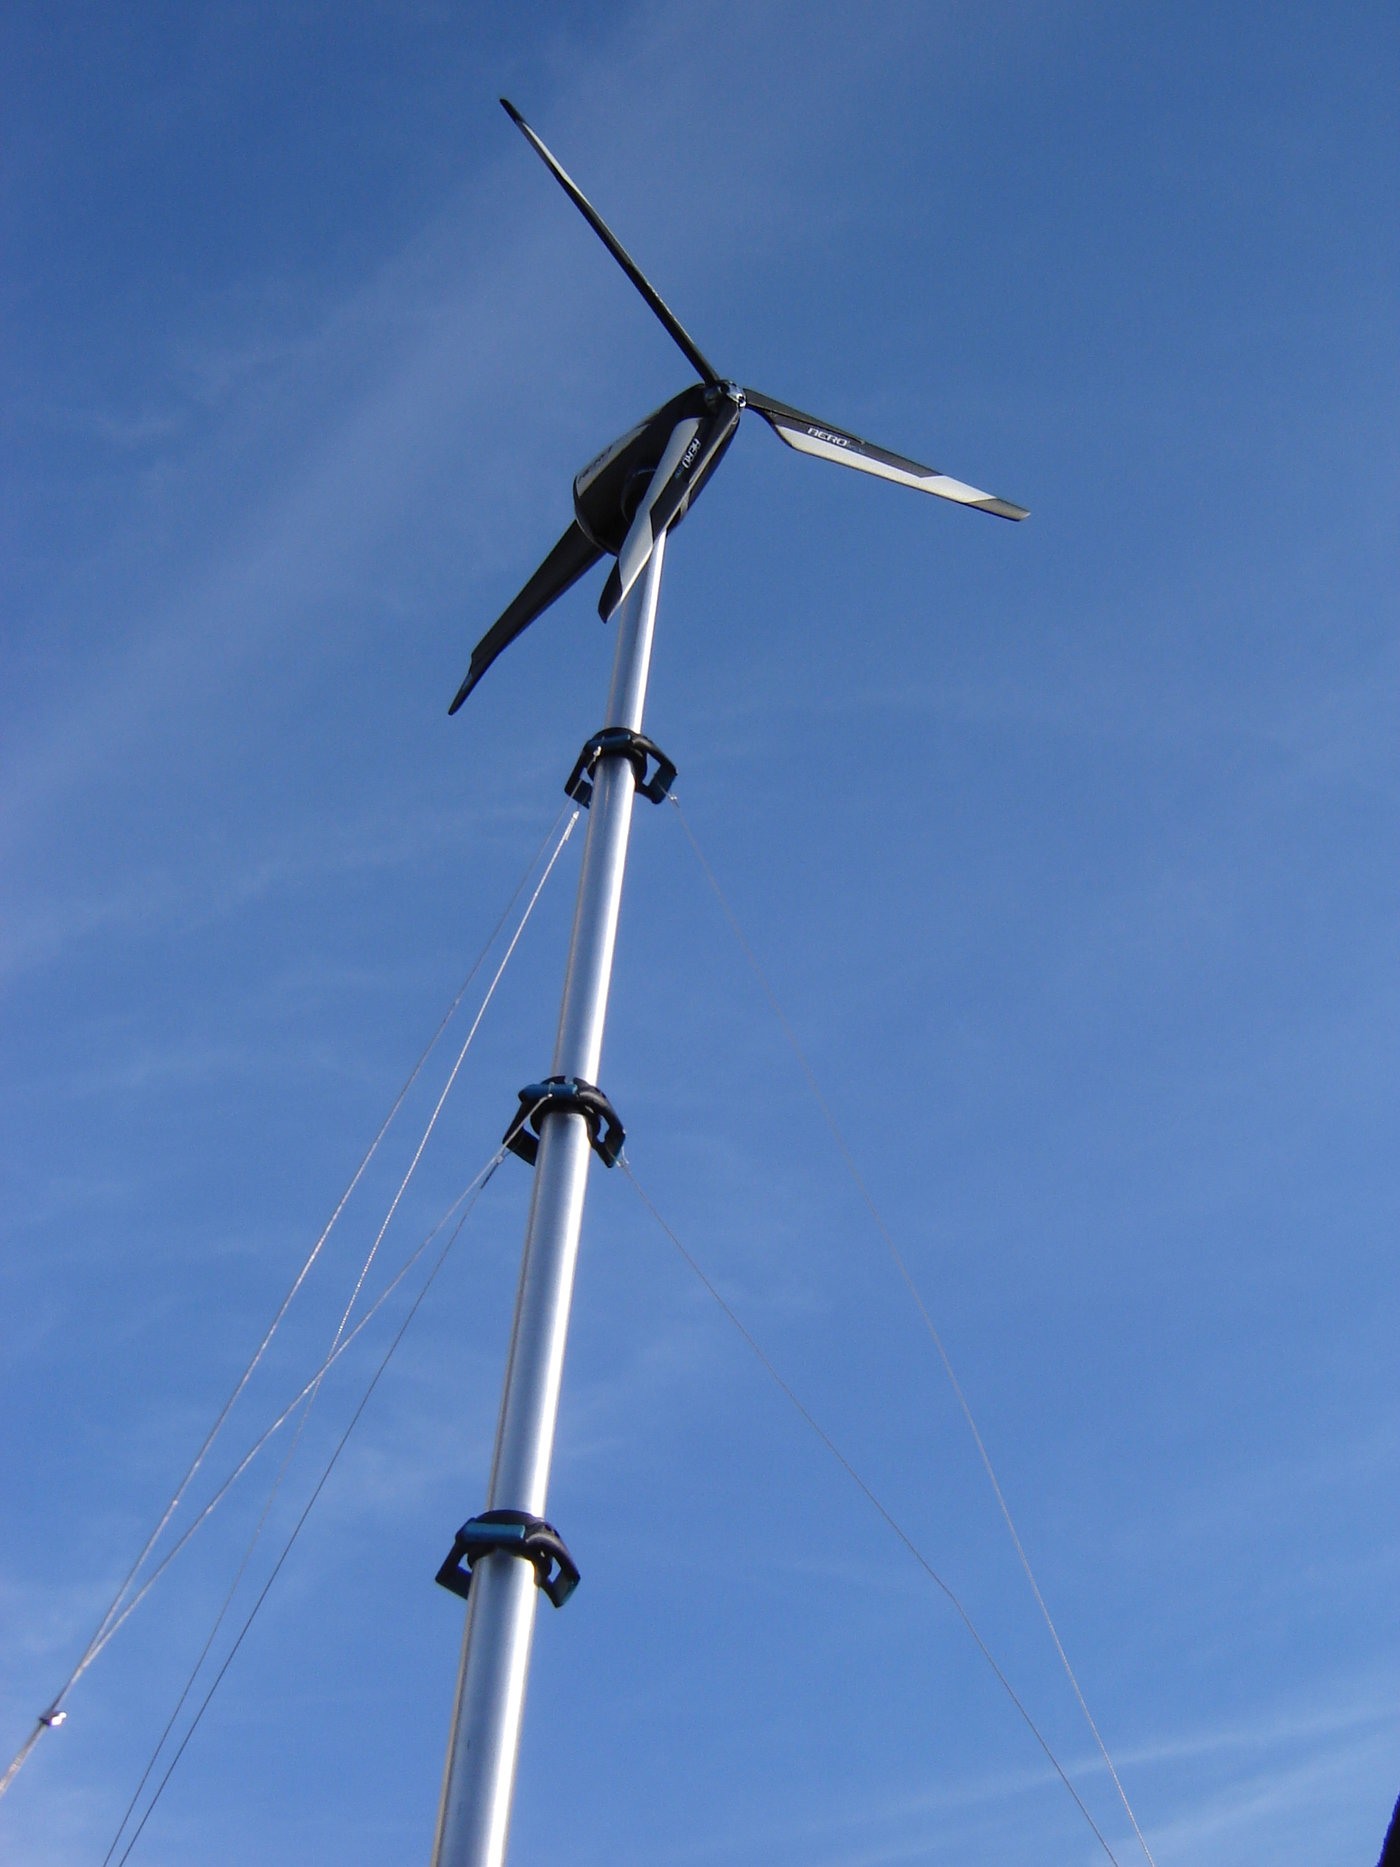 Portable Wind power Generator by Sergio Ohashi at Coroflot